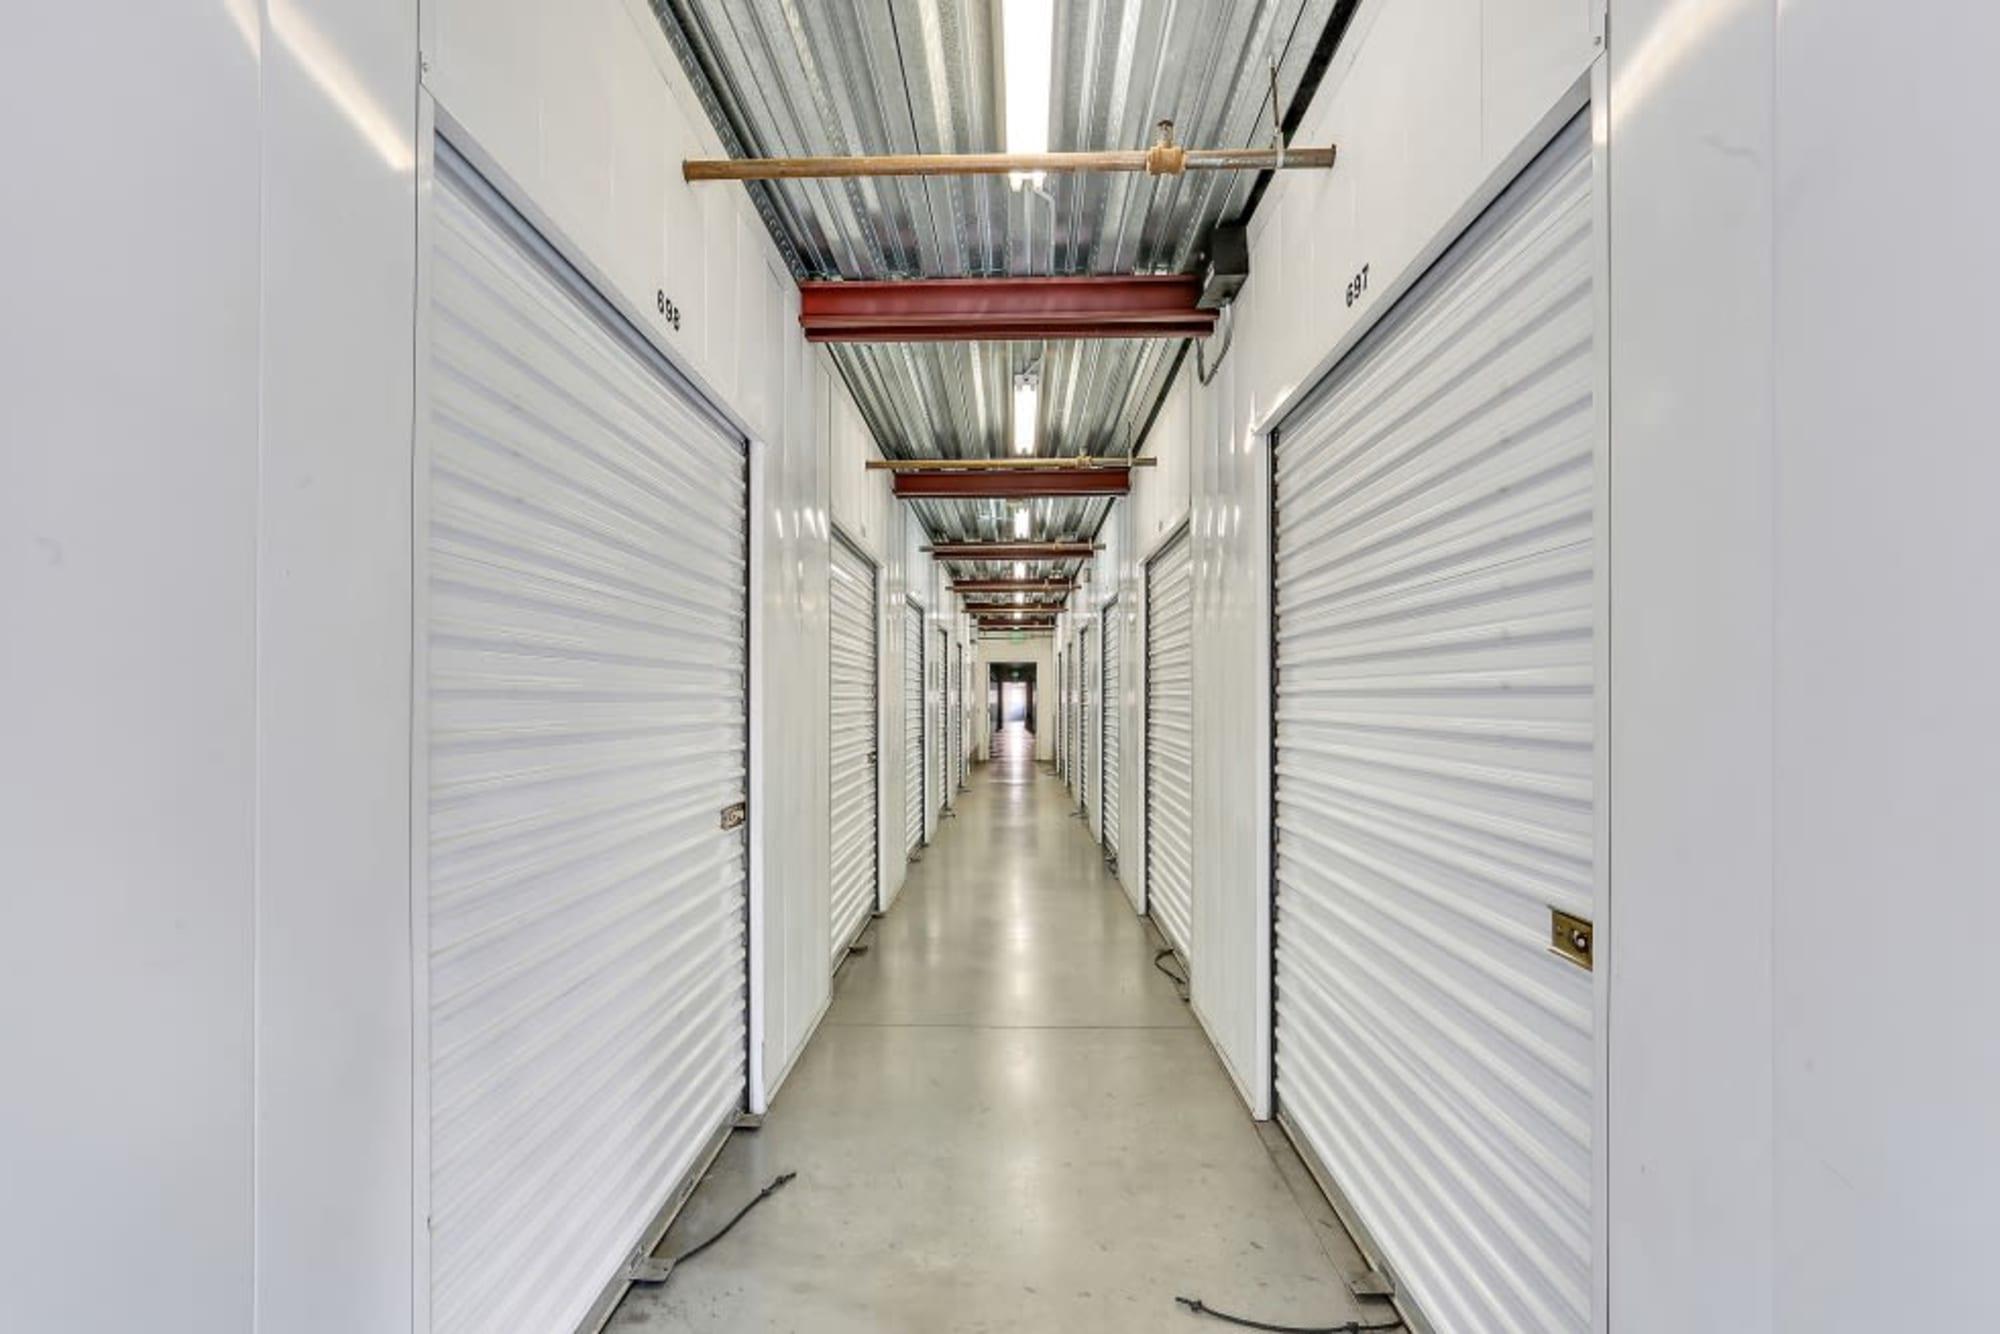 Indoor storage units at A-1 Self Storage in Paramount, California